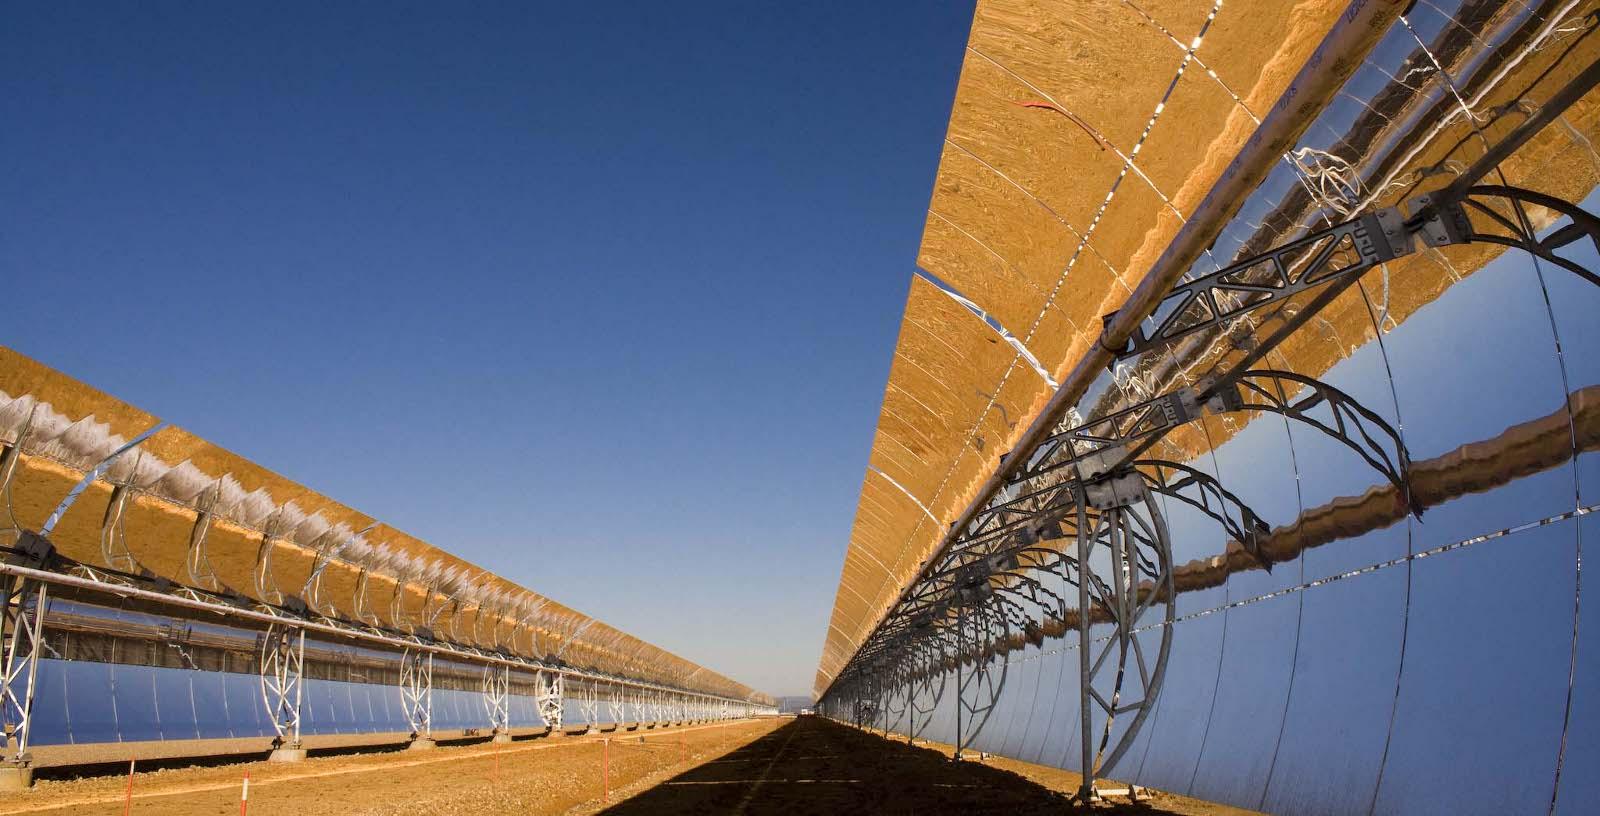 La_Africana_Thermosolar_Power_Plant_Idom